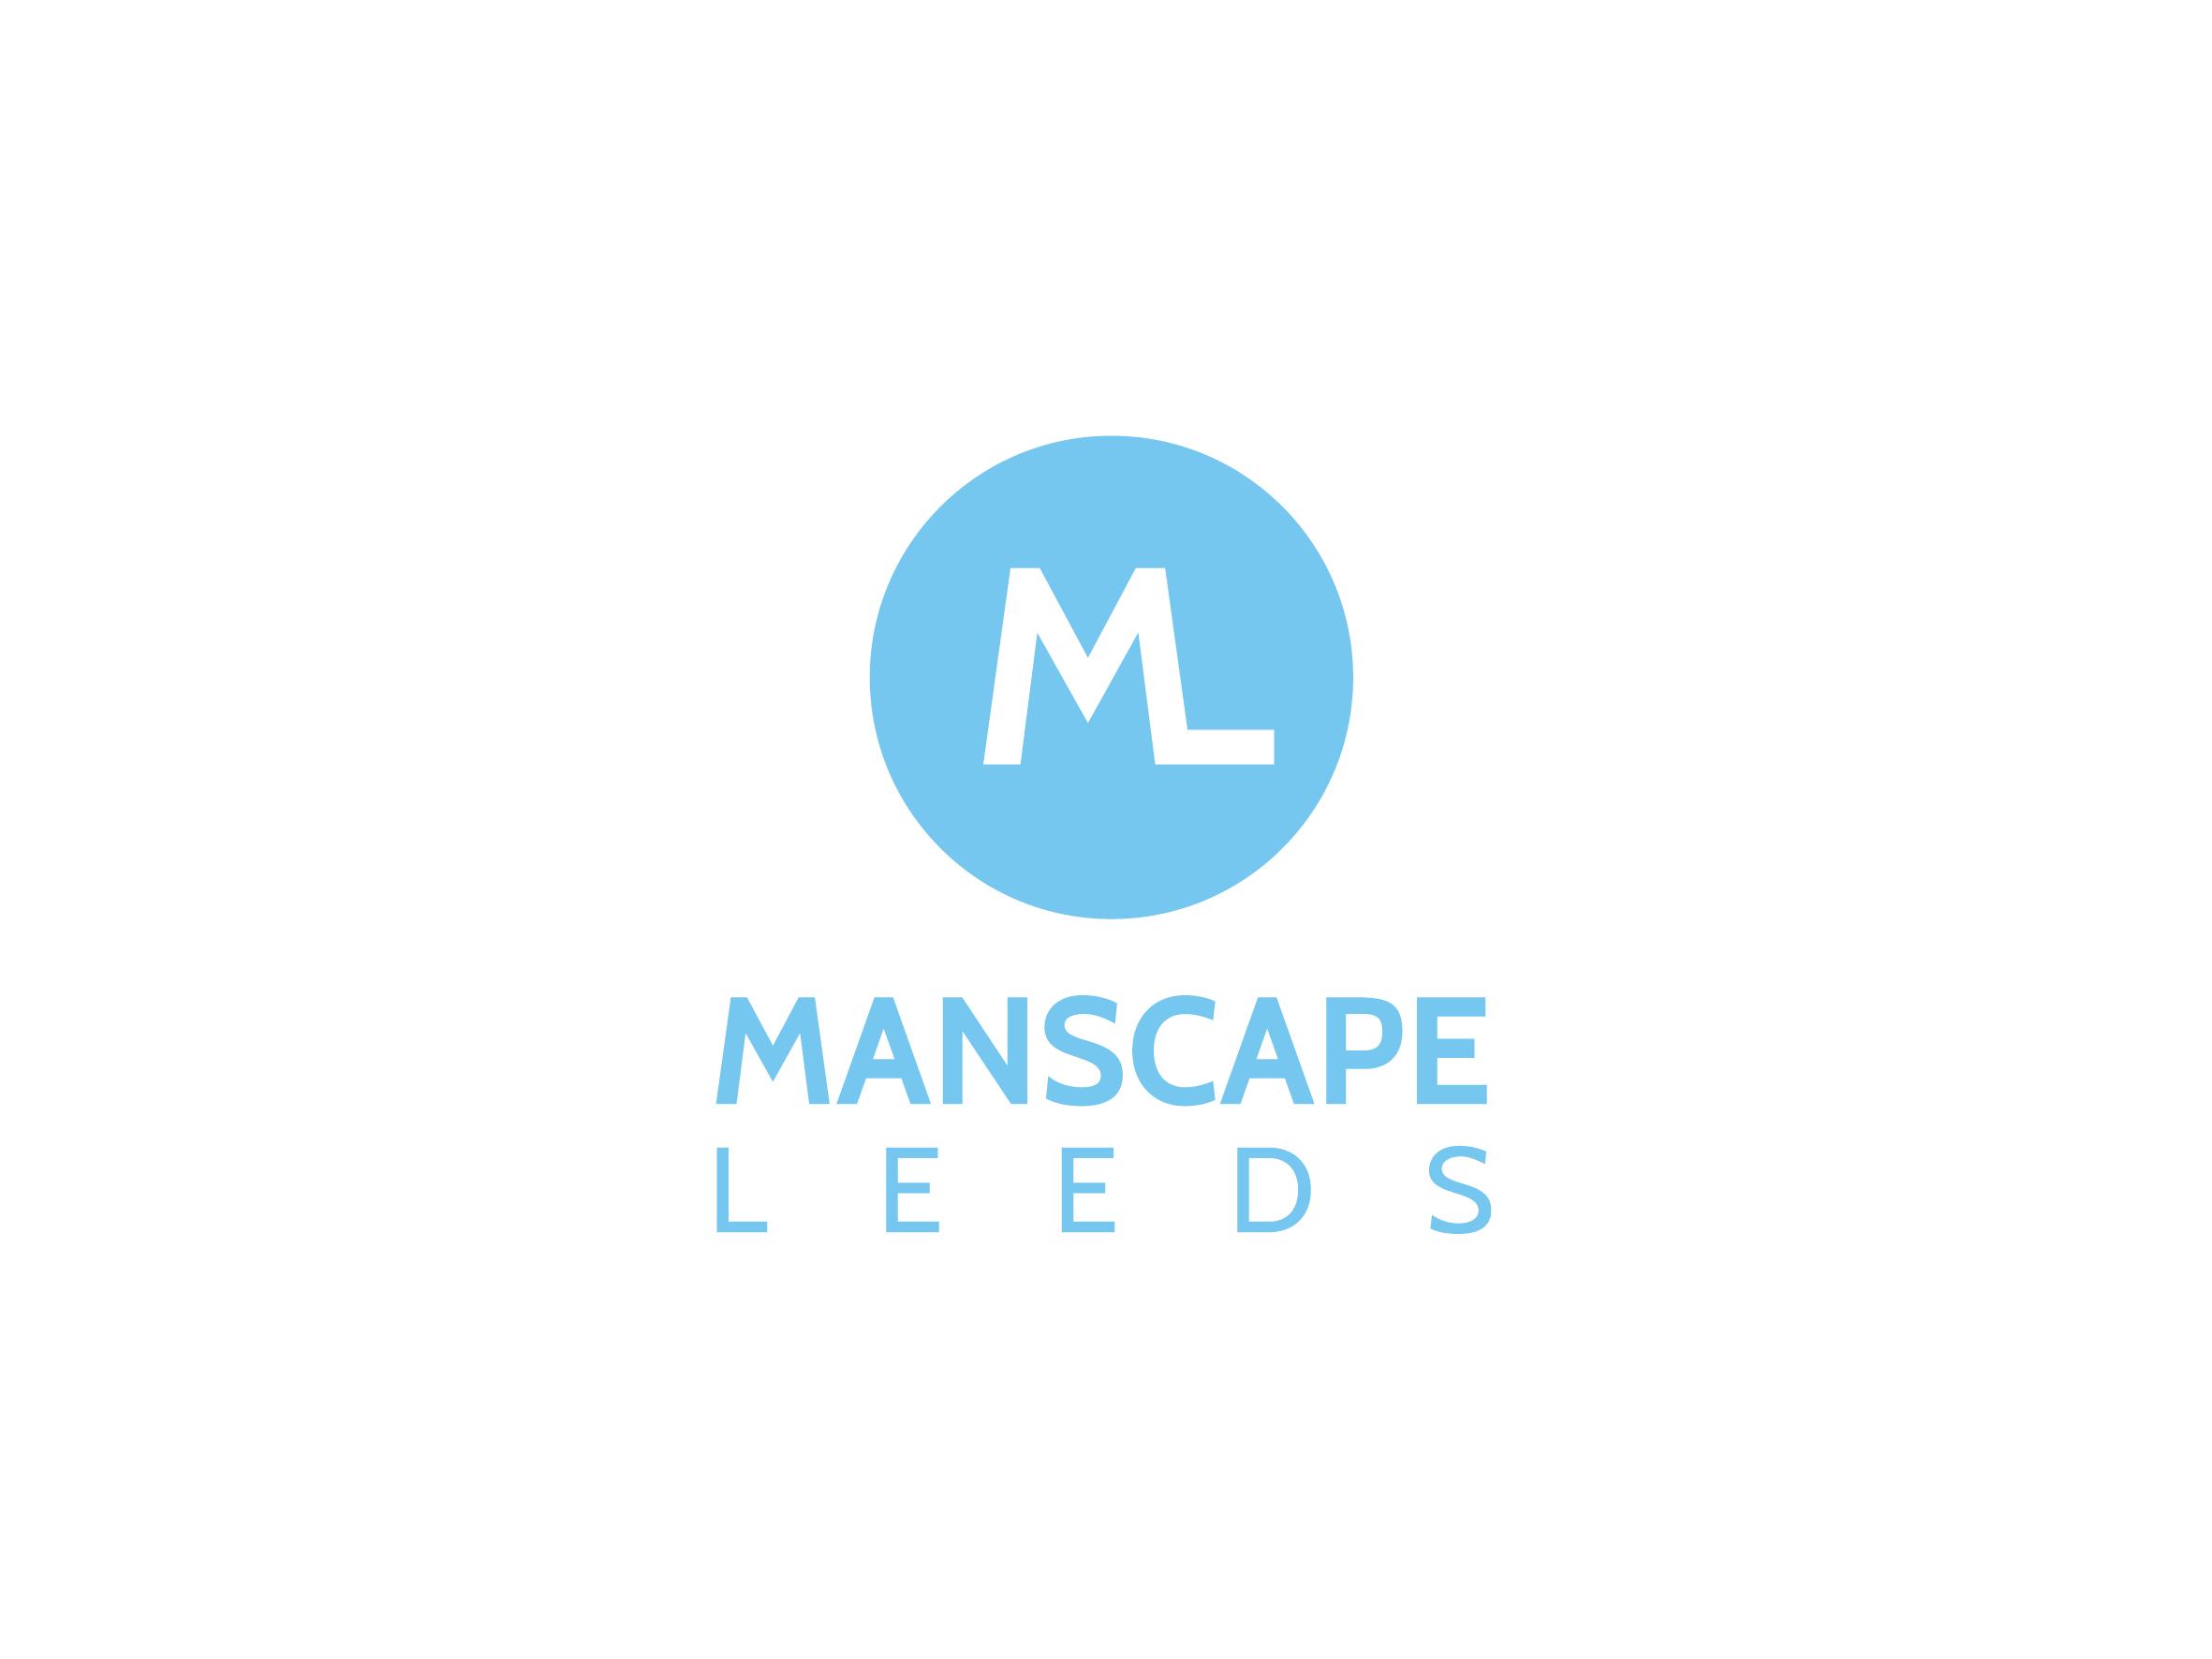 manscape leeds male grooming logo design designed by Dakini Design Saltaire, Shipley, Bradford